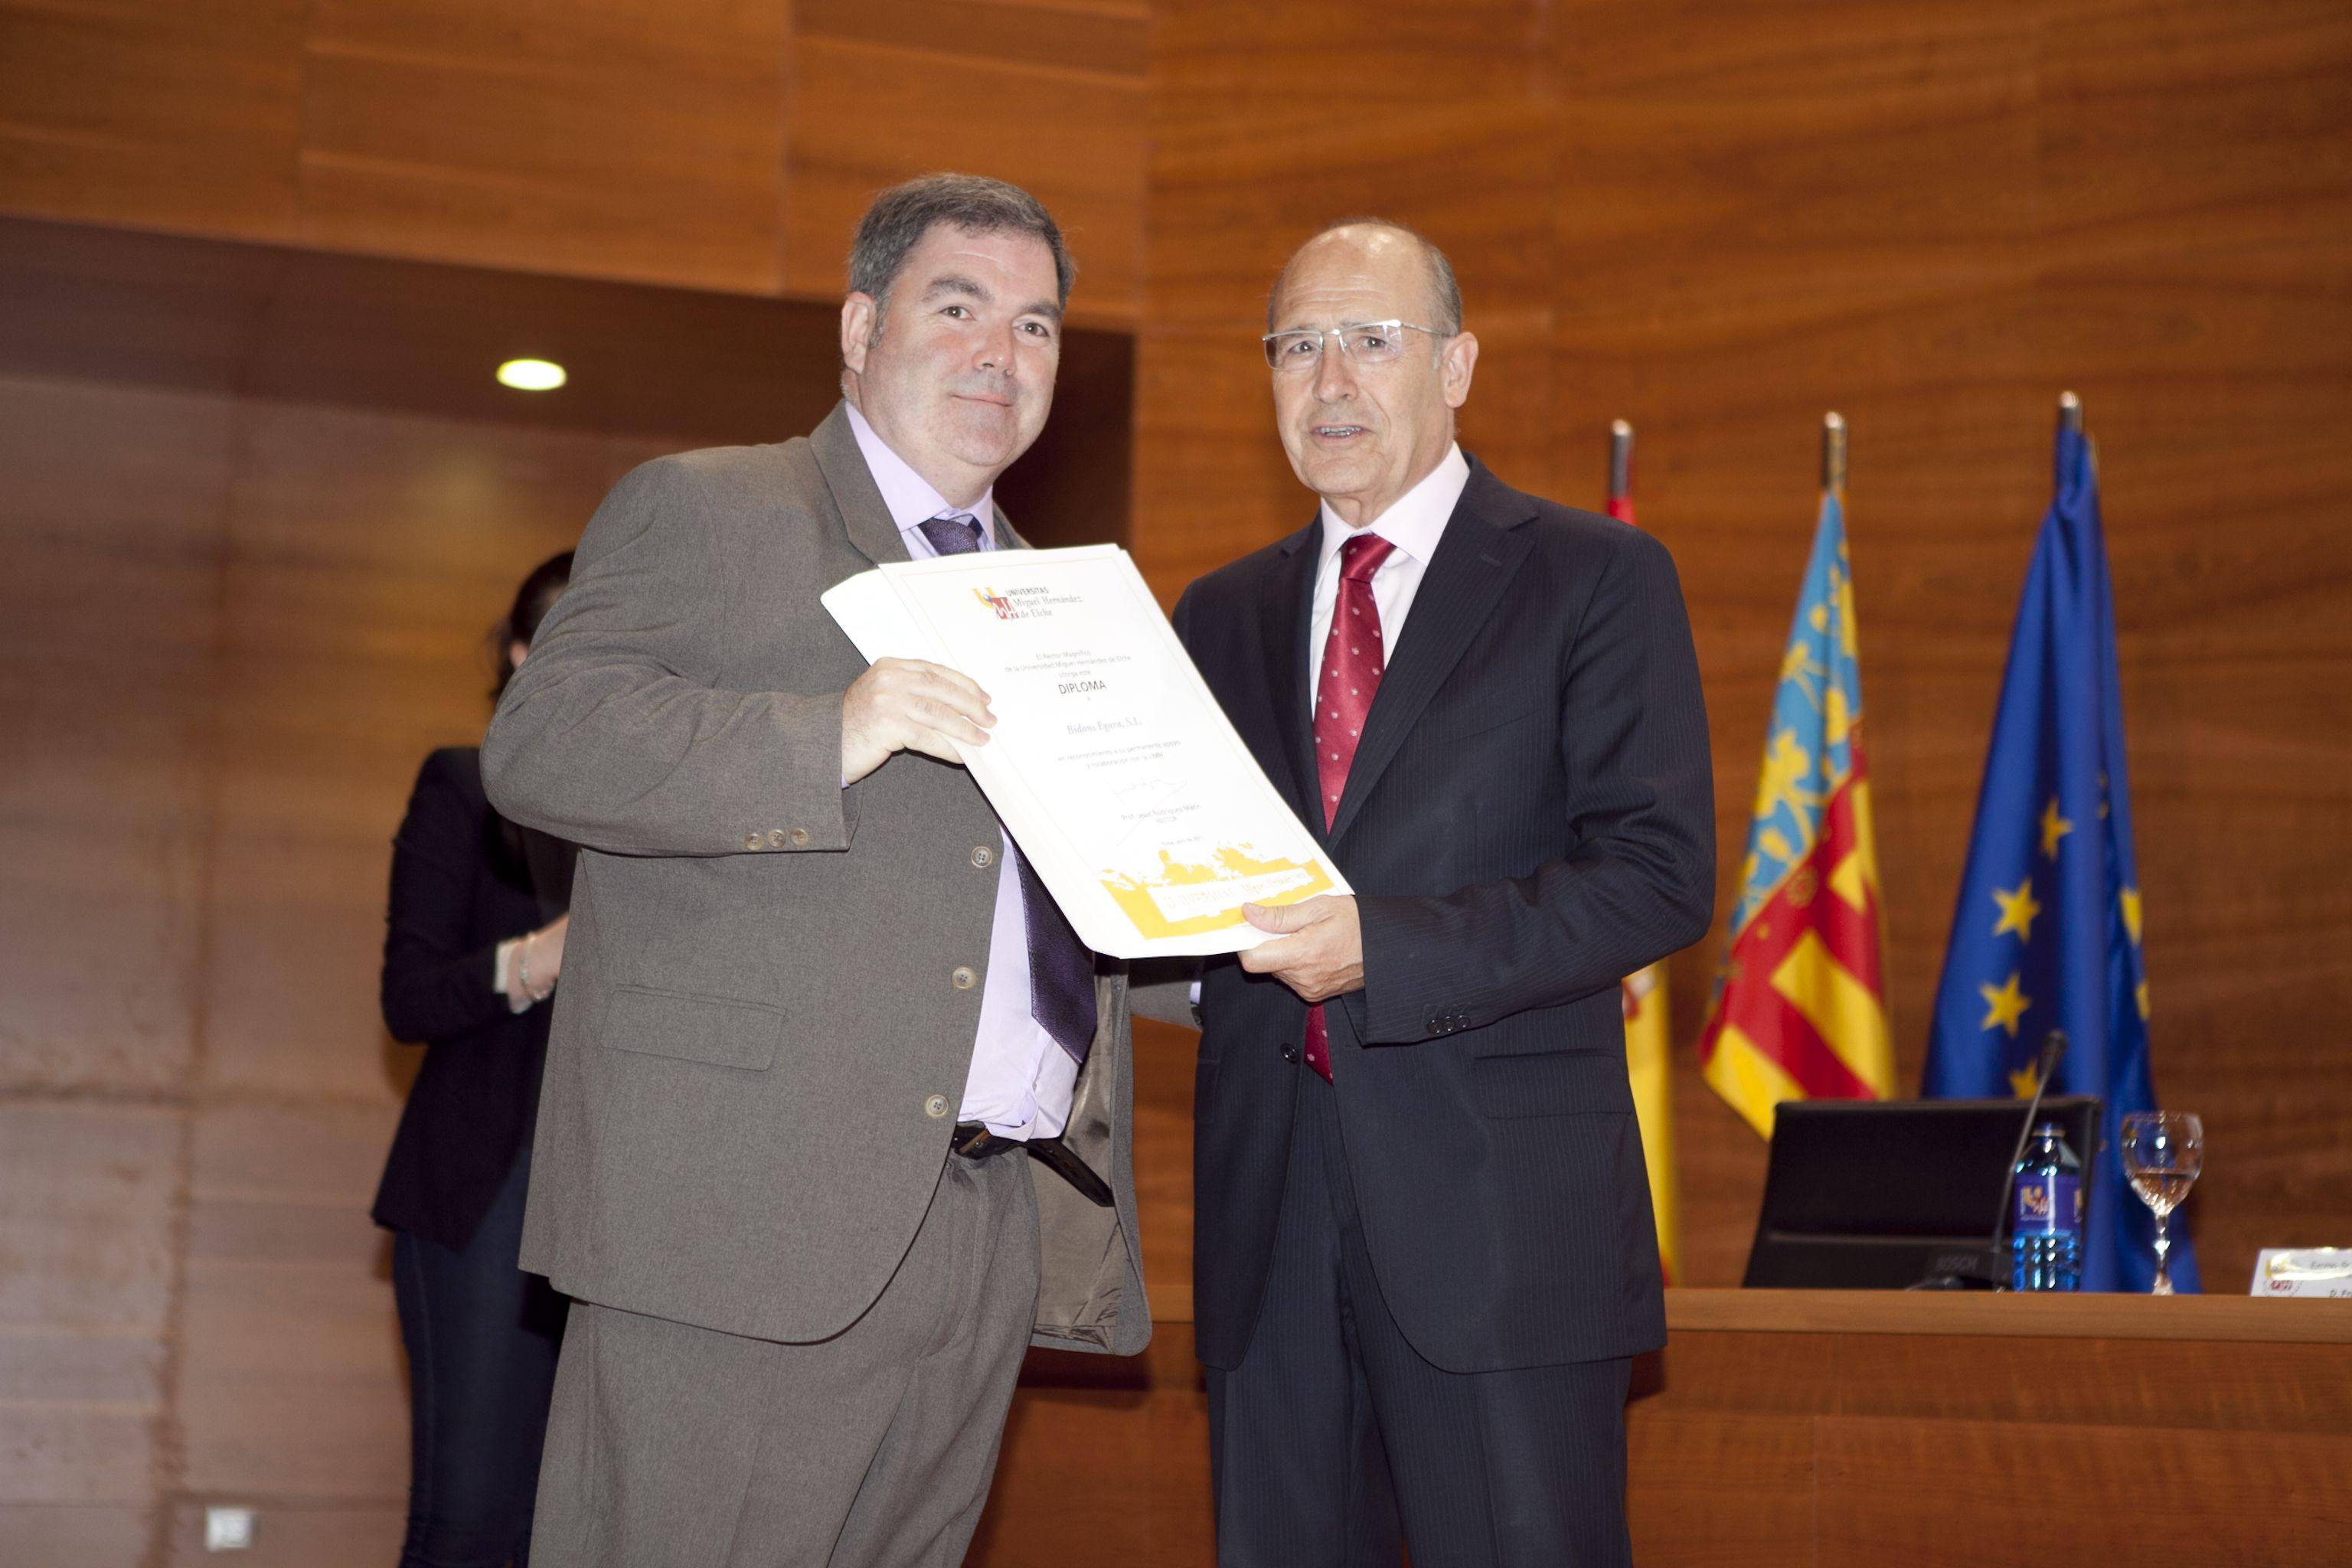 umh-diplomas-rector_mg_6717.jpg